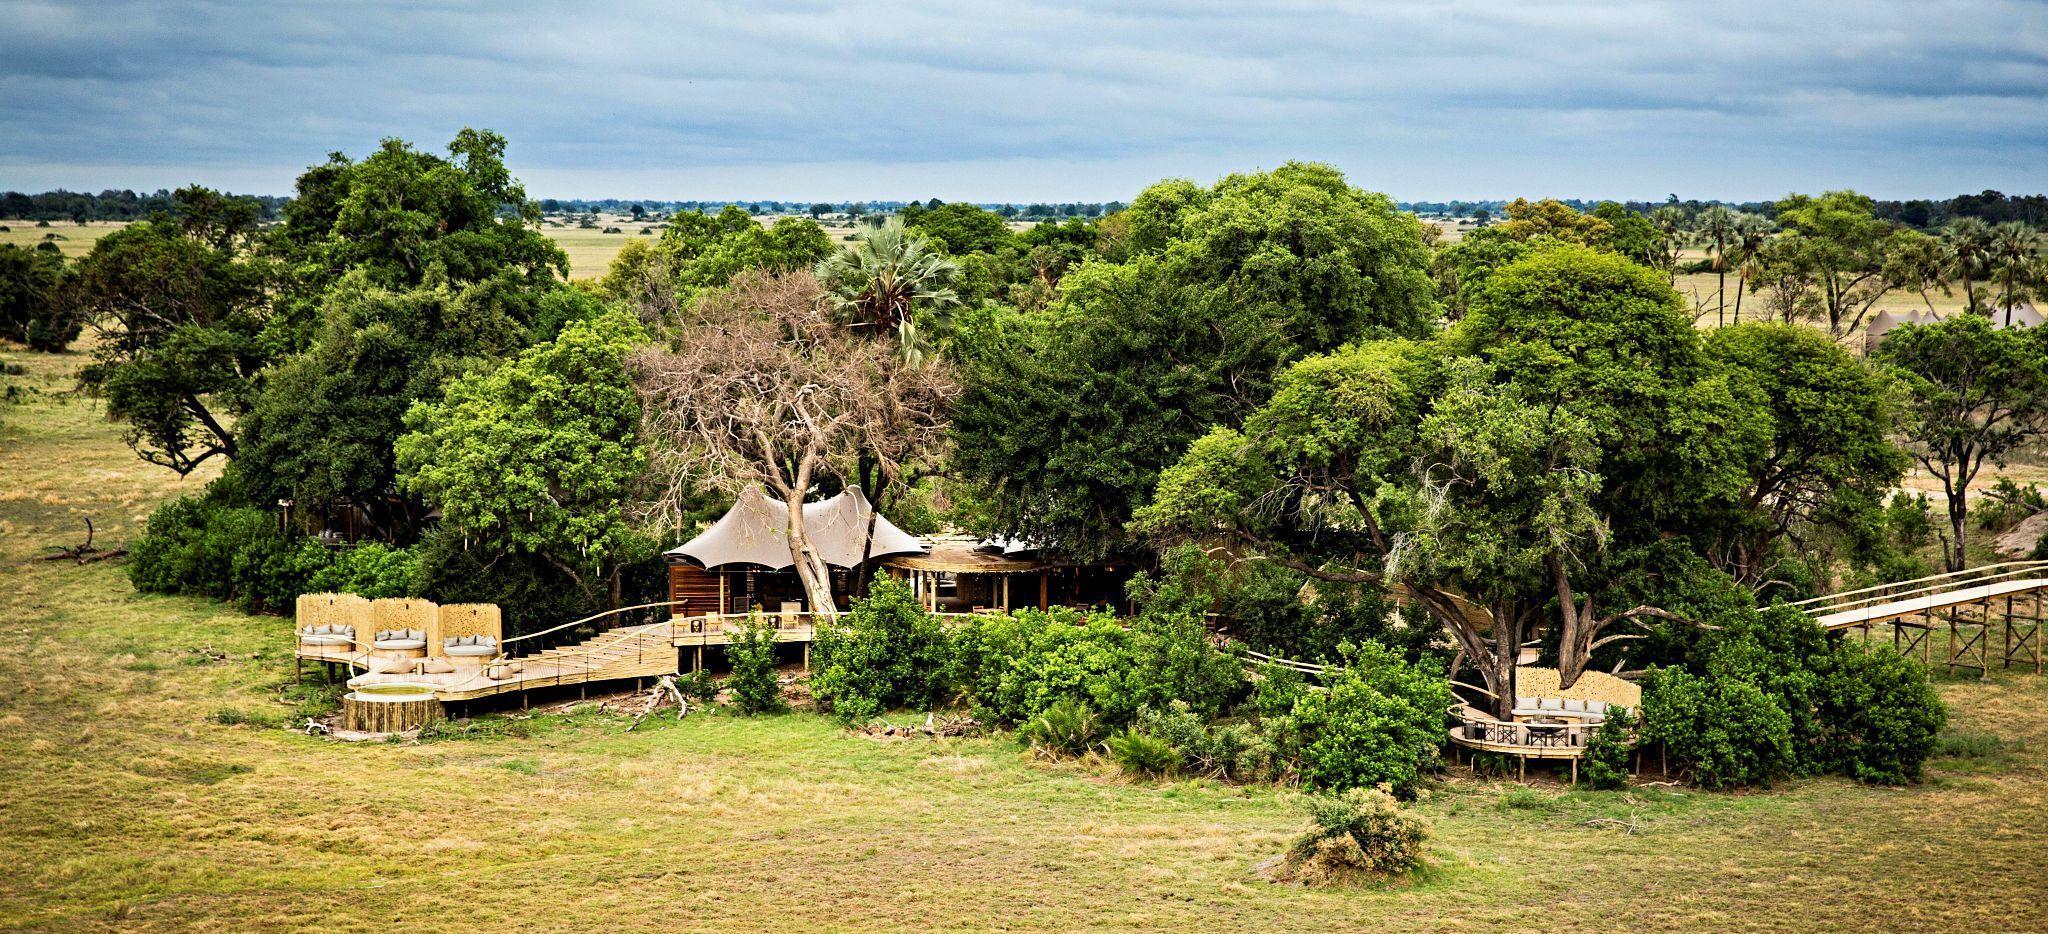 "Luftaufnahme der Hotelanlage der Safari-Lodge ""Little Mombo"" in Botsuana"